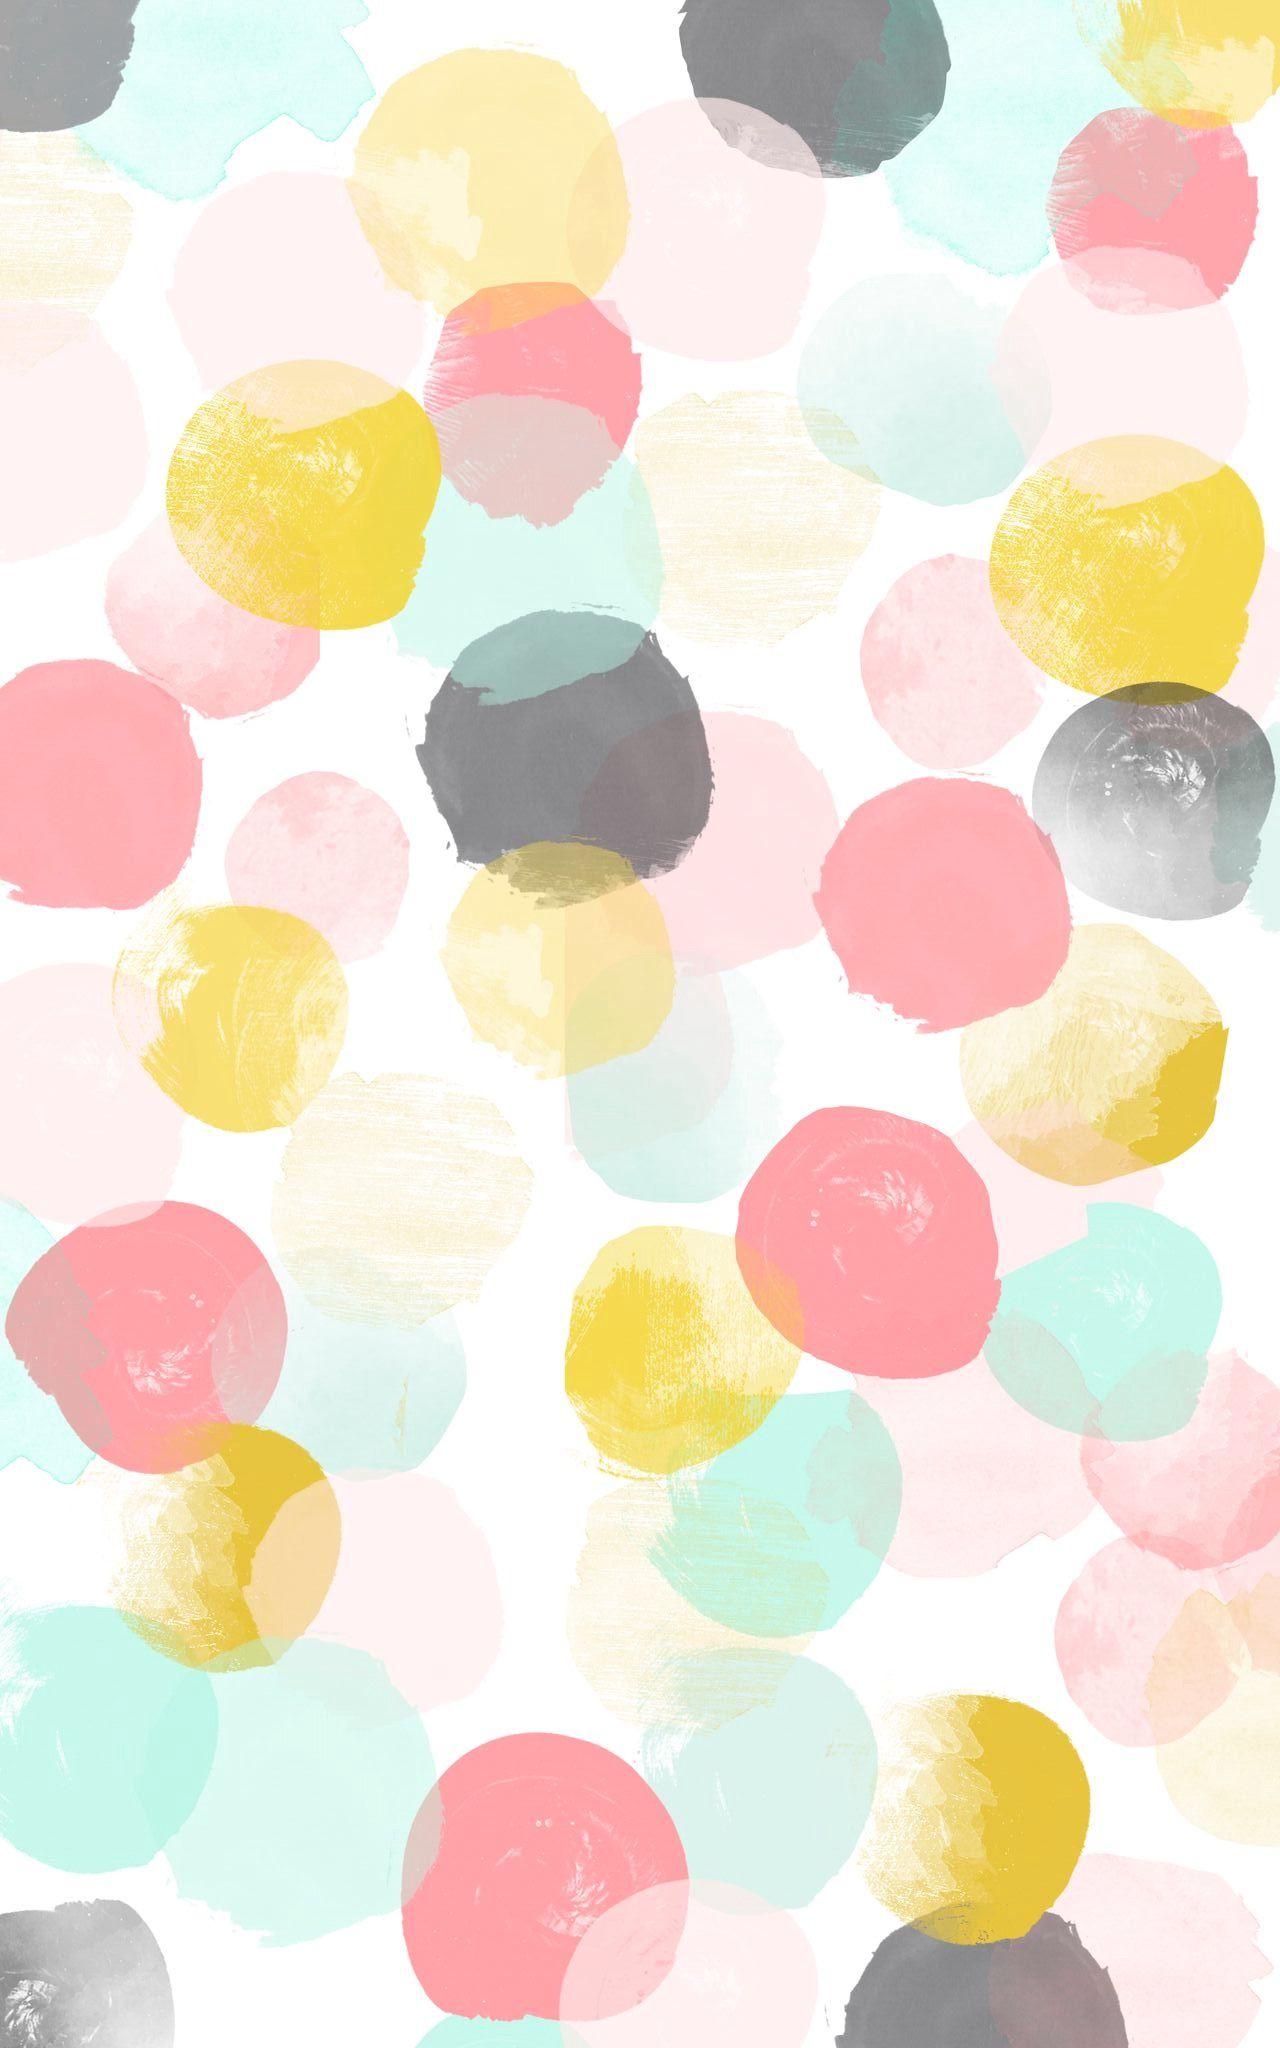 Dots Wallpaper Screen Savers Wallpapers Dots Wallpaper Marimekko Wallpaper